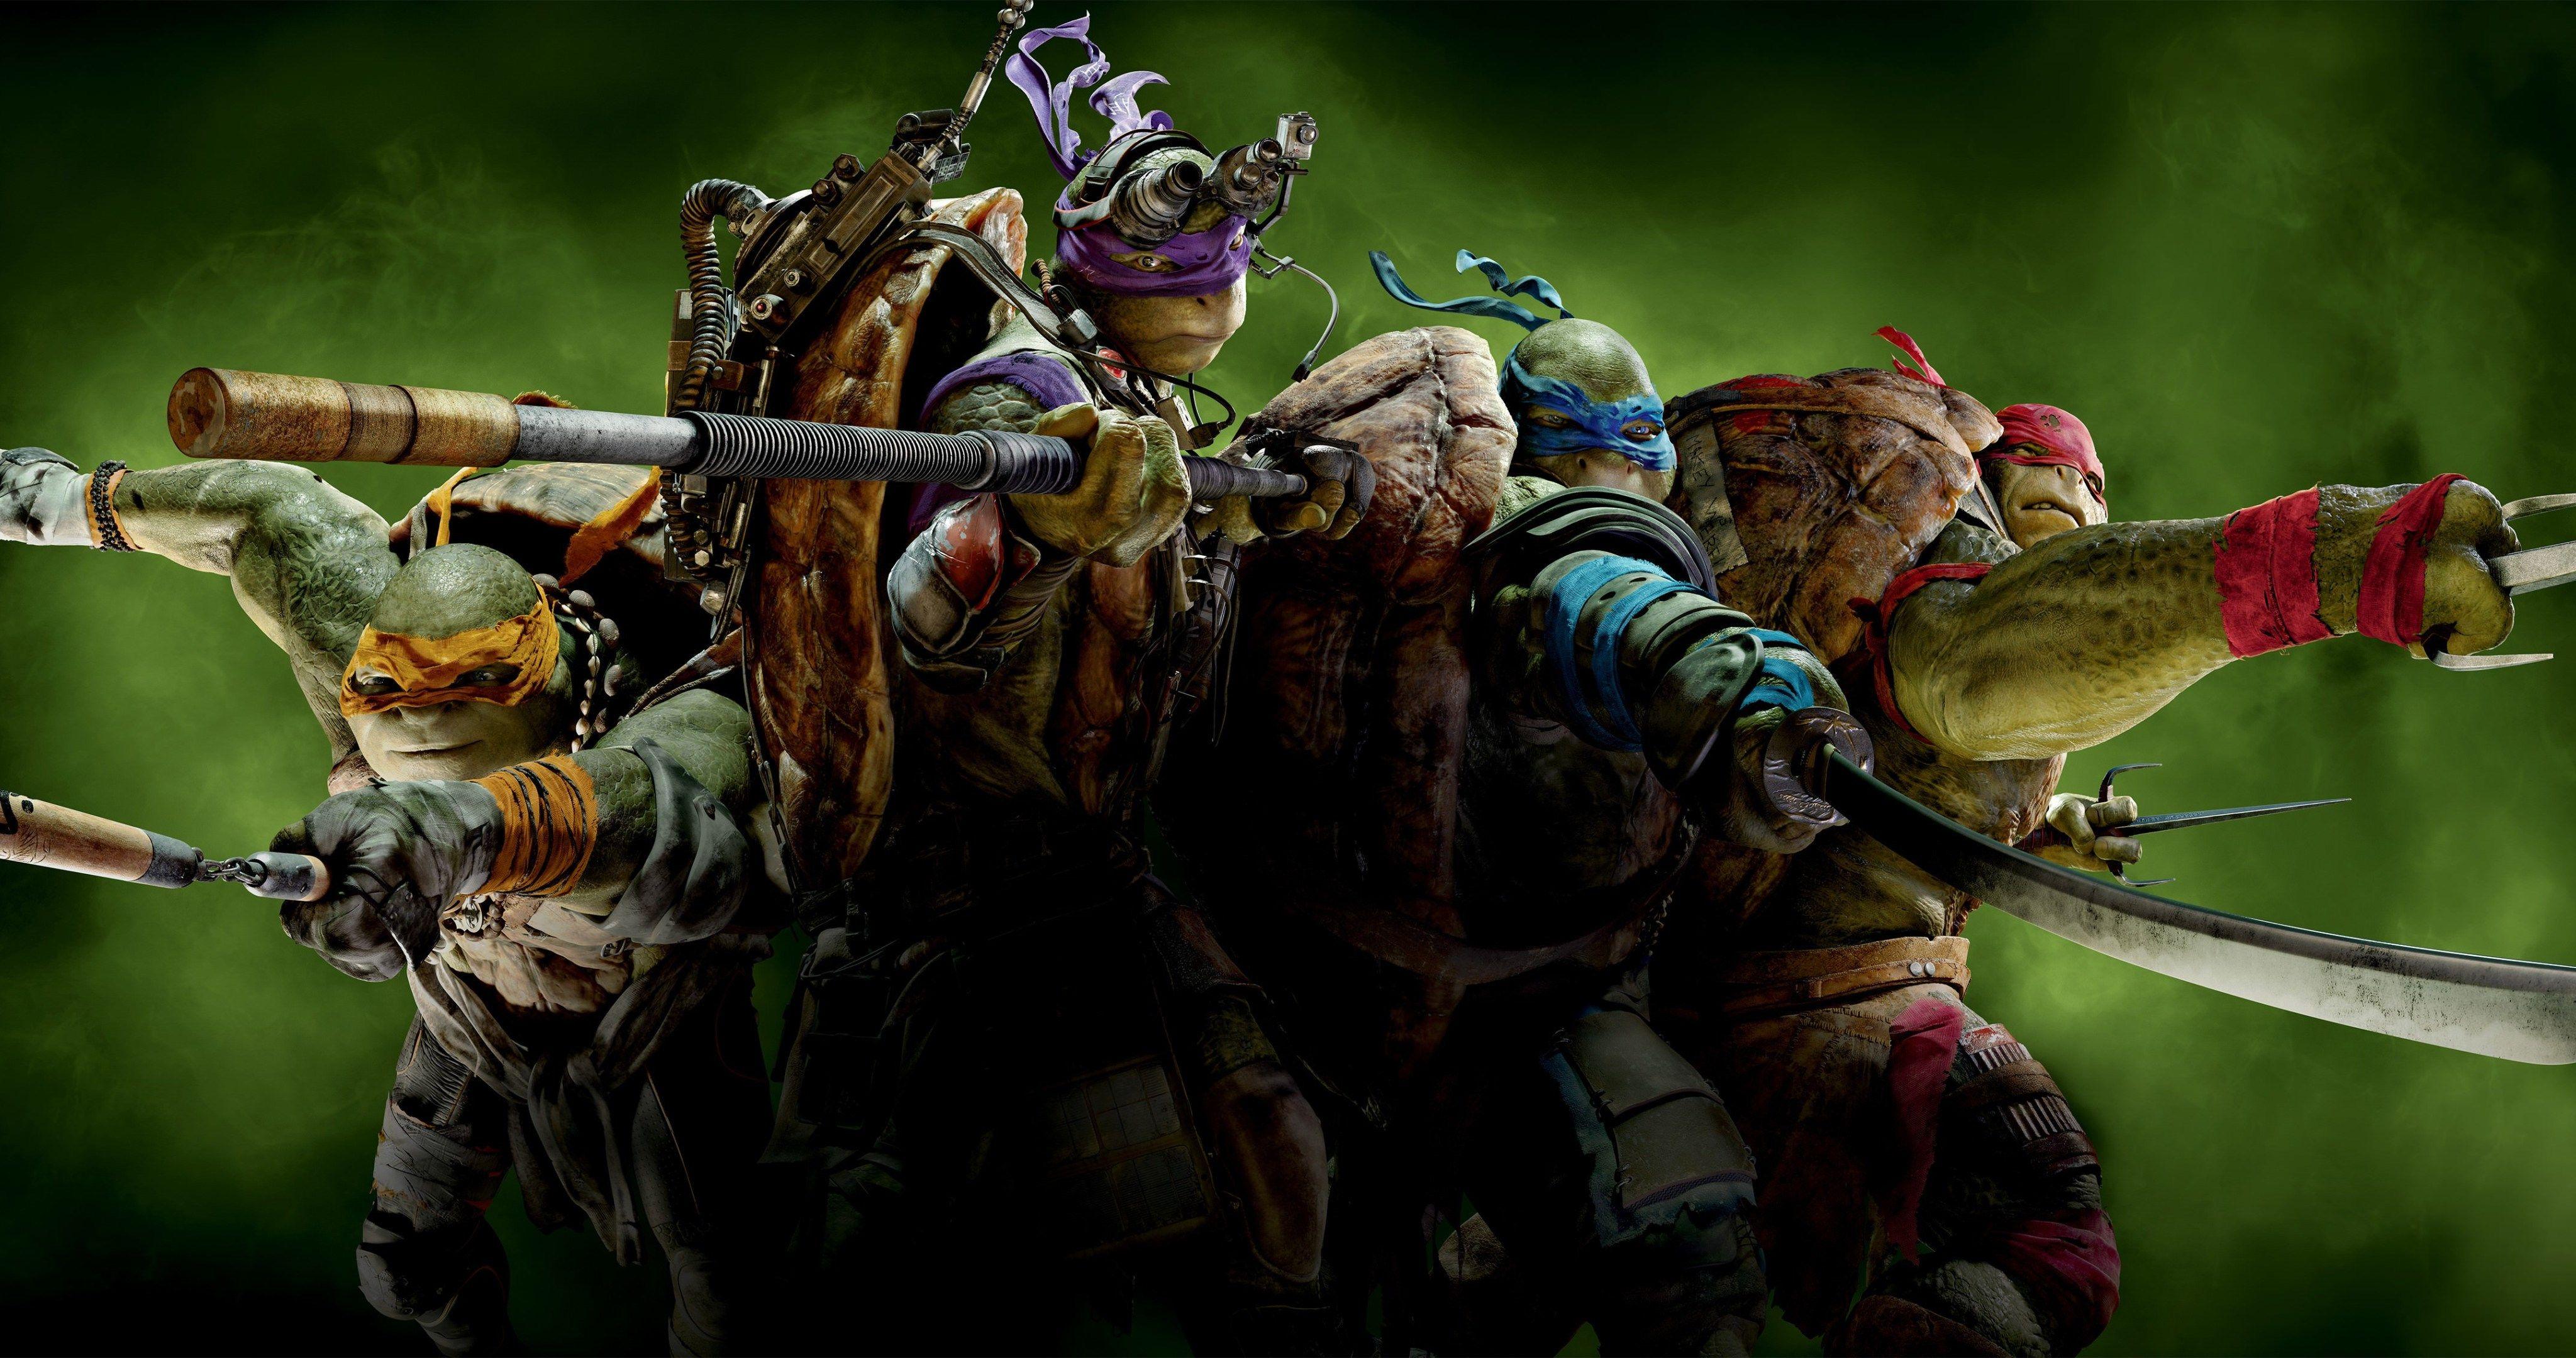 teenage mutant ninja turtles 67 4k ultra hd wallpaper